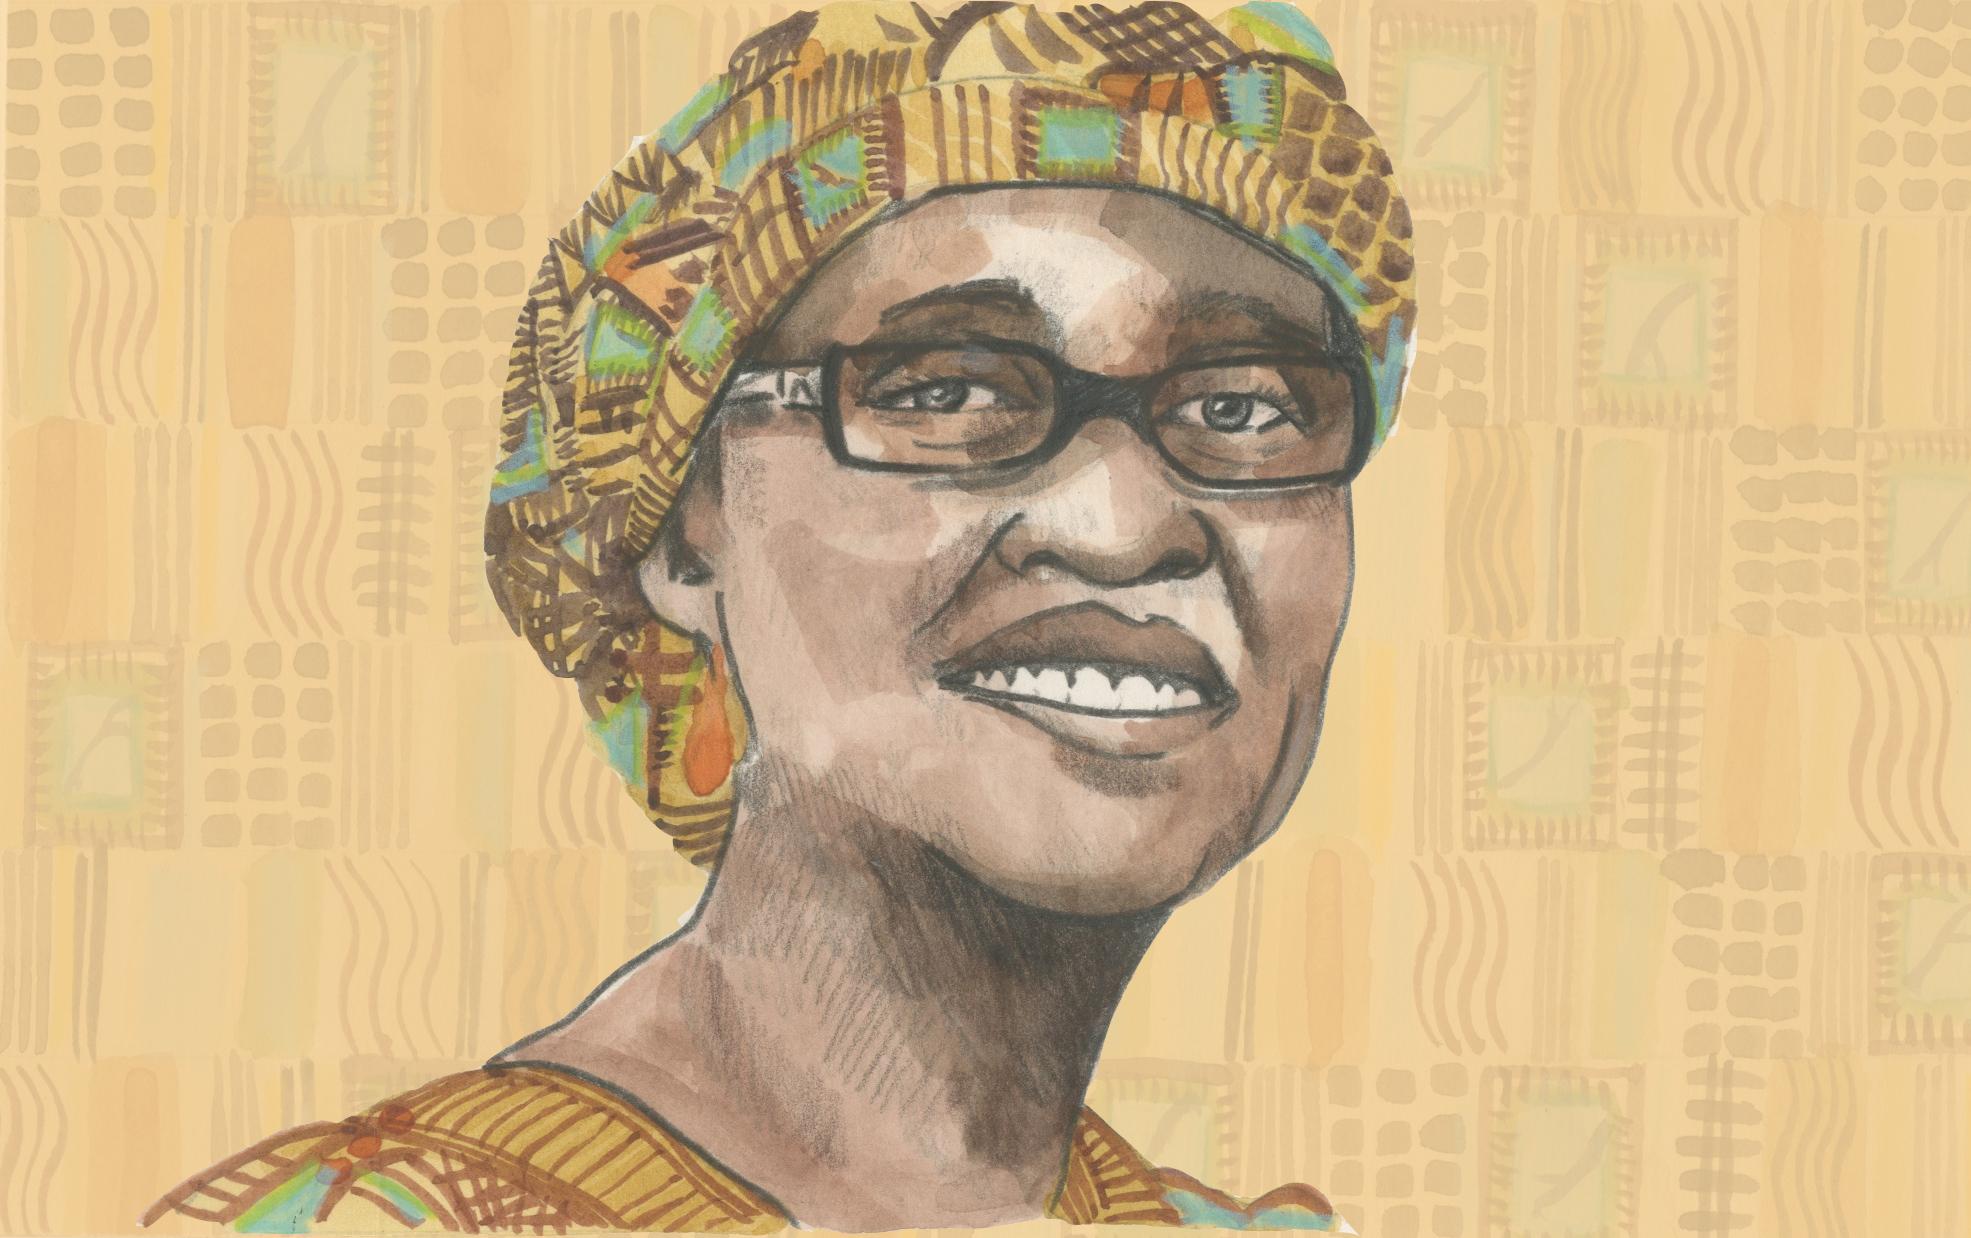 05/02/15Ugandan born Winnie Byanyima, executive director of Oxfam, the first African to run a global development agency